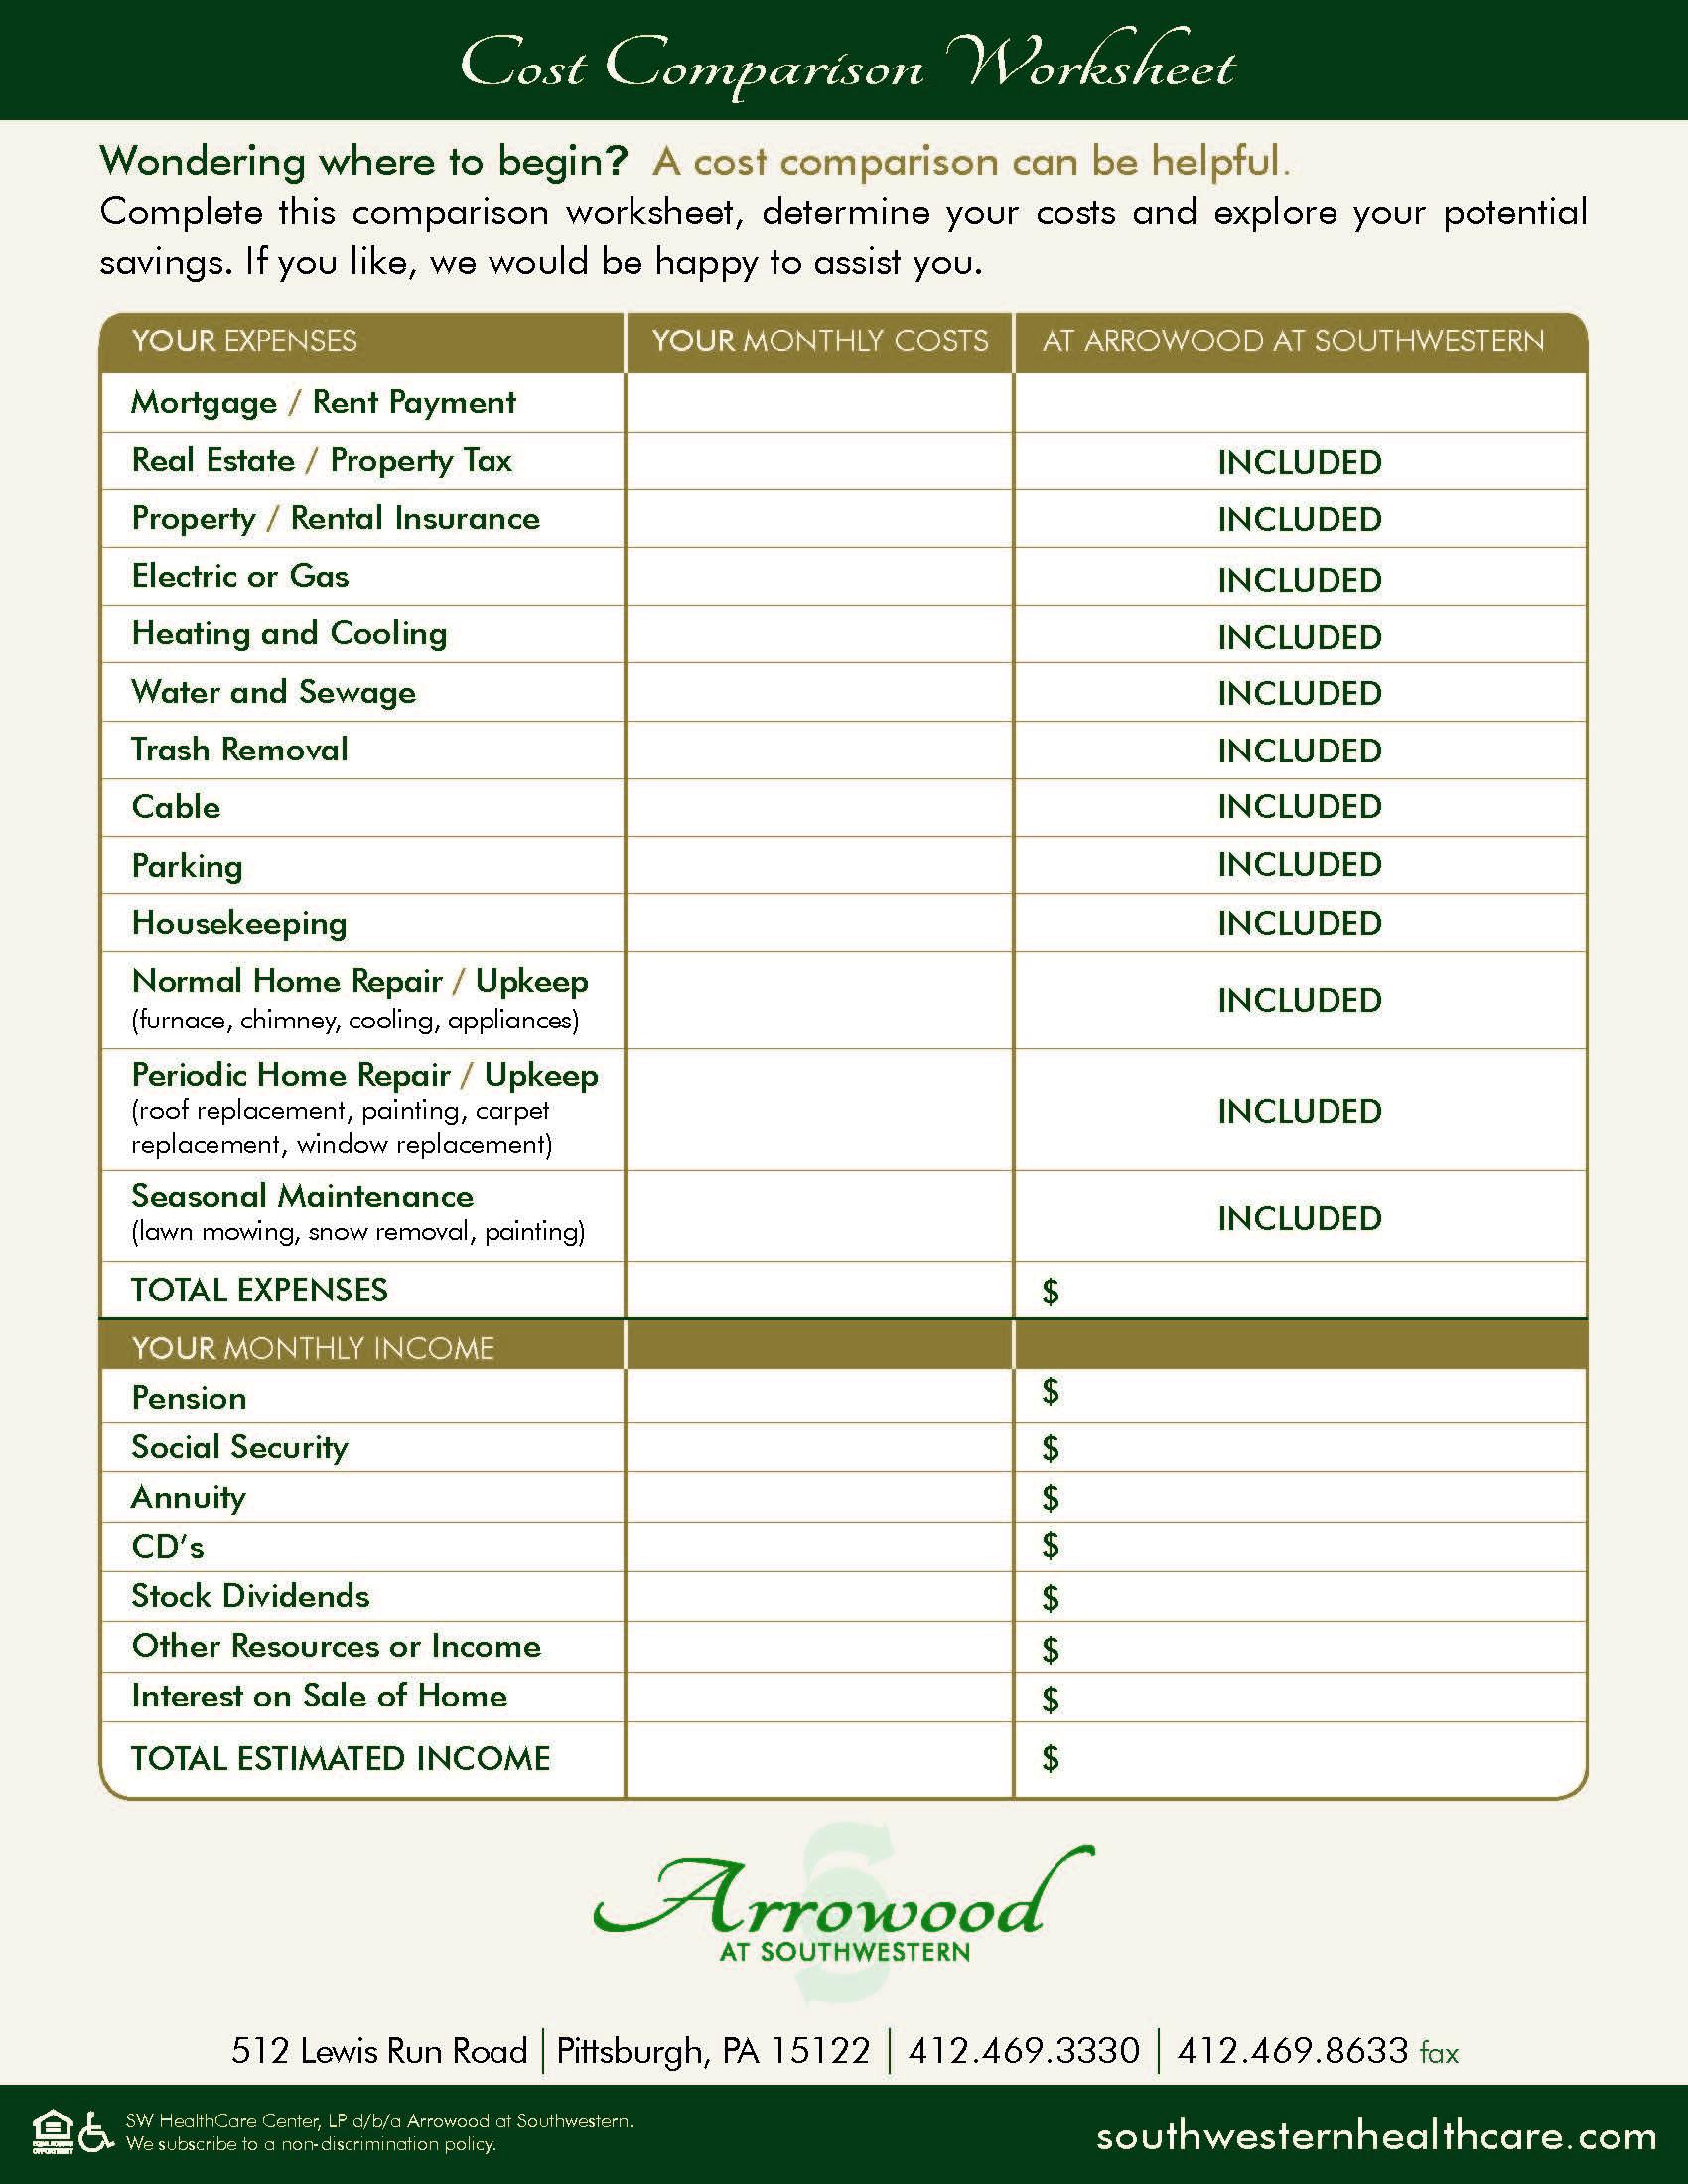 Arrowood Services